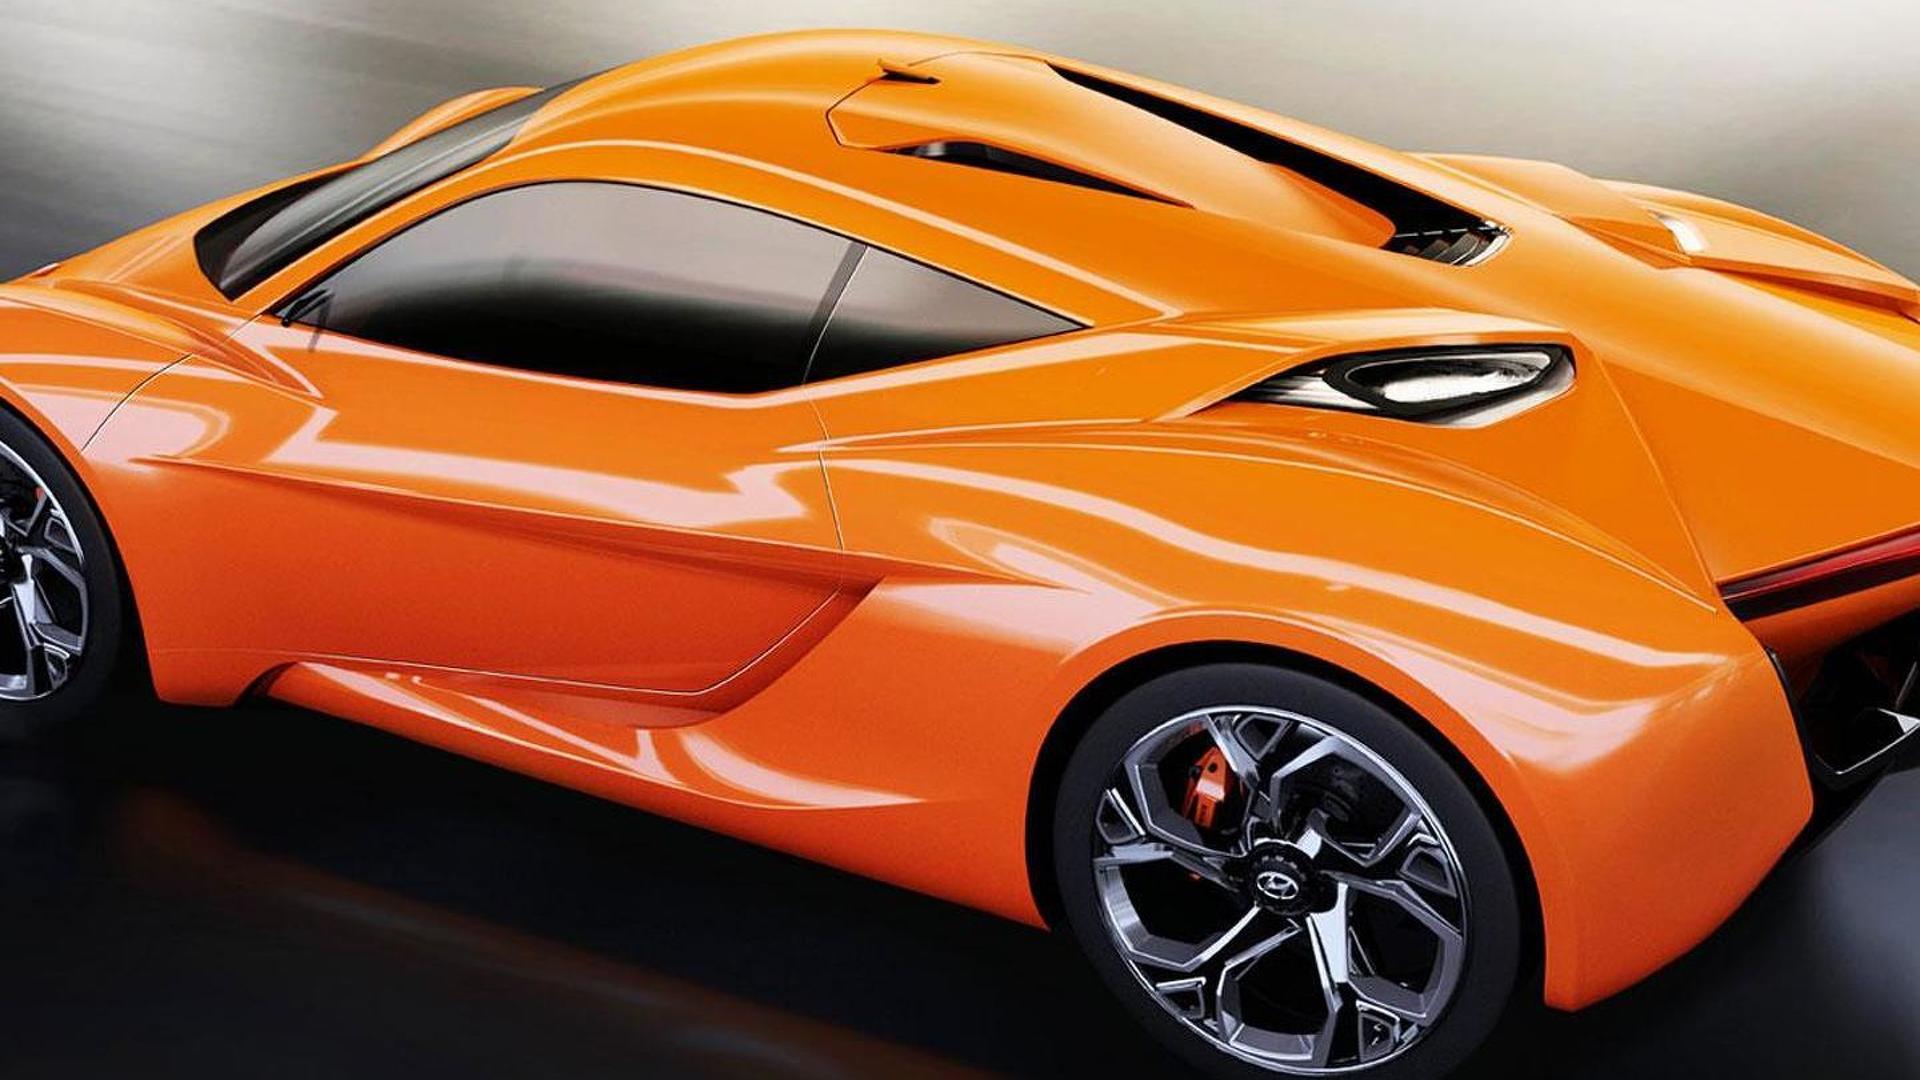 IED designers envision Hyundai PassoCorto concept rivaling Alfa Romeo 4C